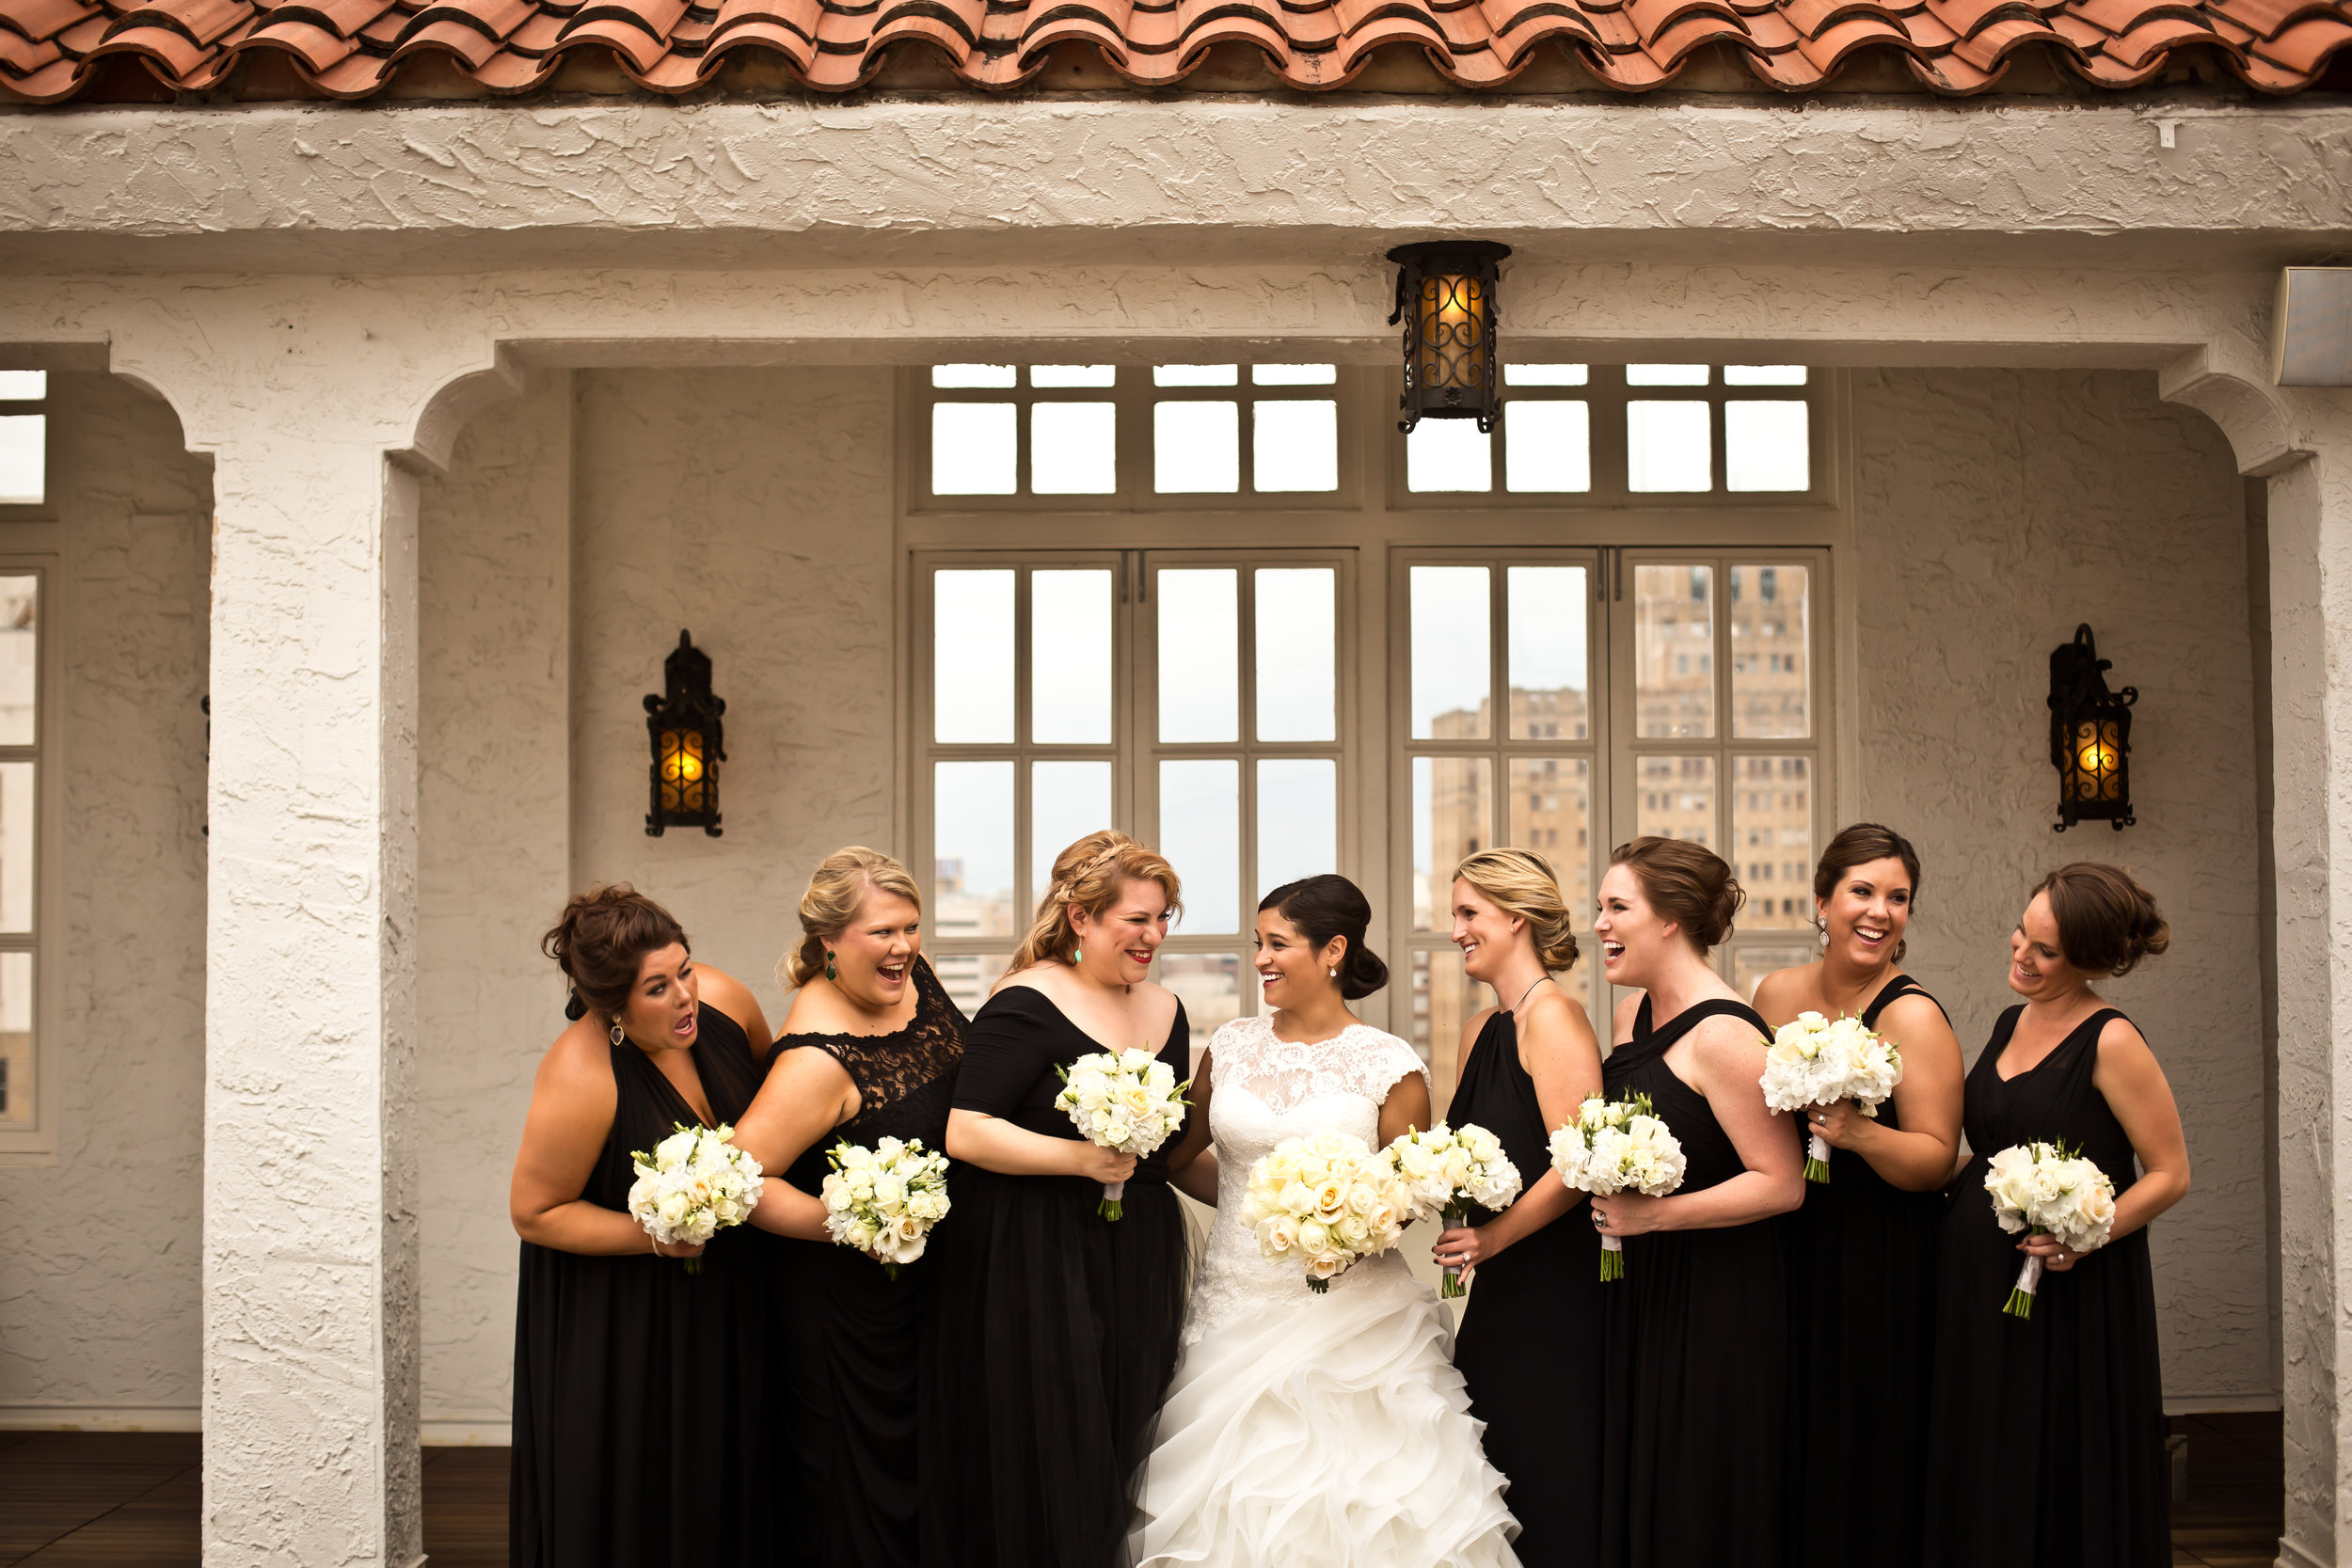 Marble_Falls_Horseshoe_Bay_Photographer_Torres_Wedding_31.jpg